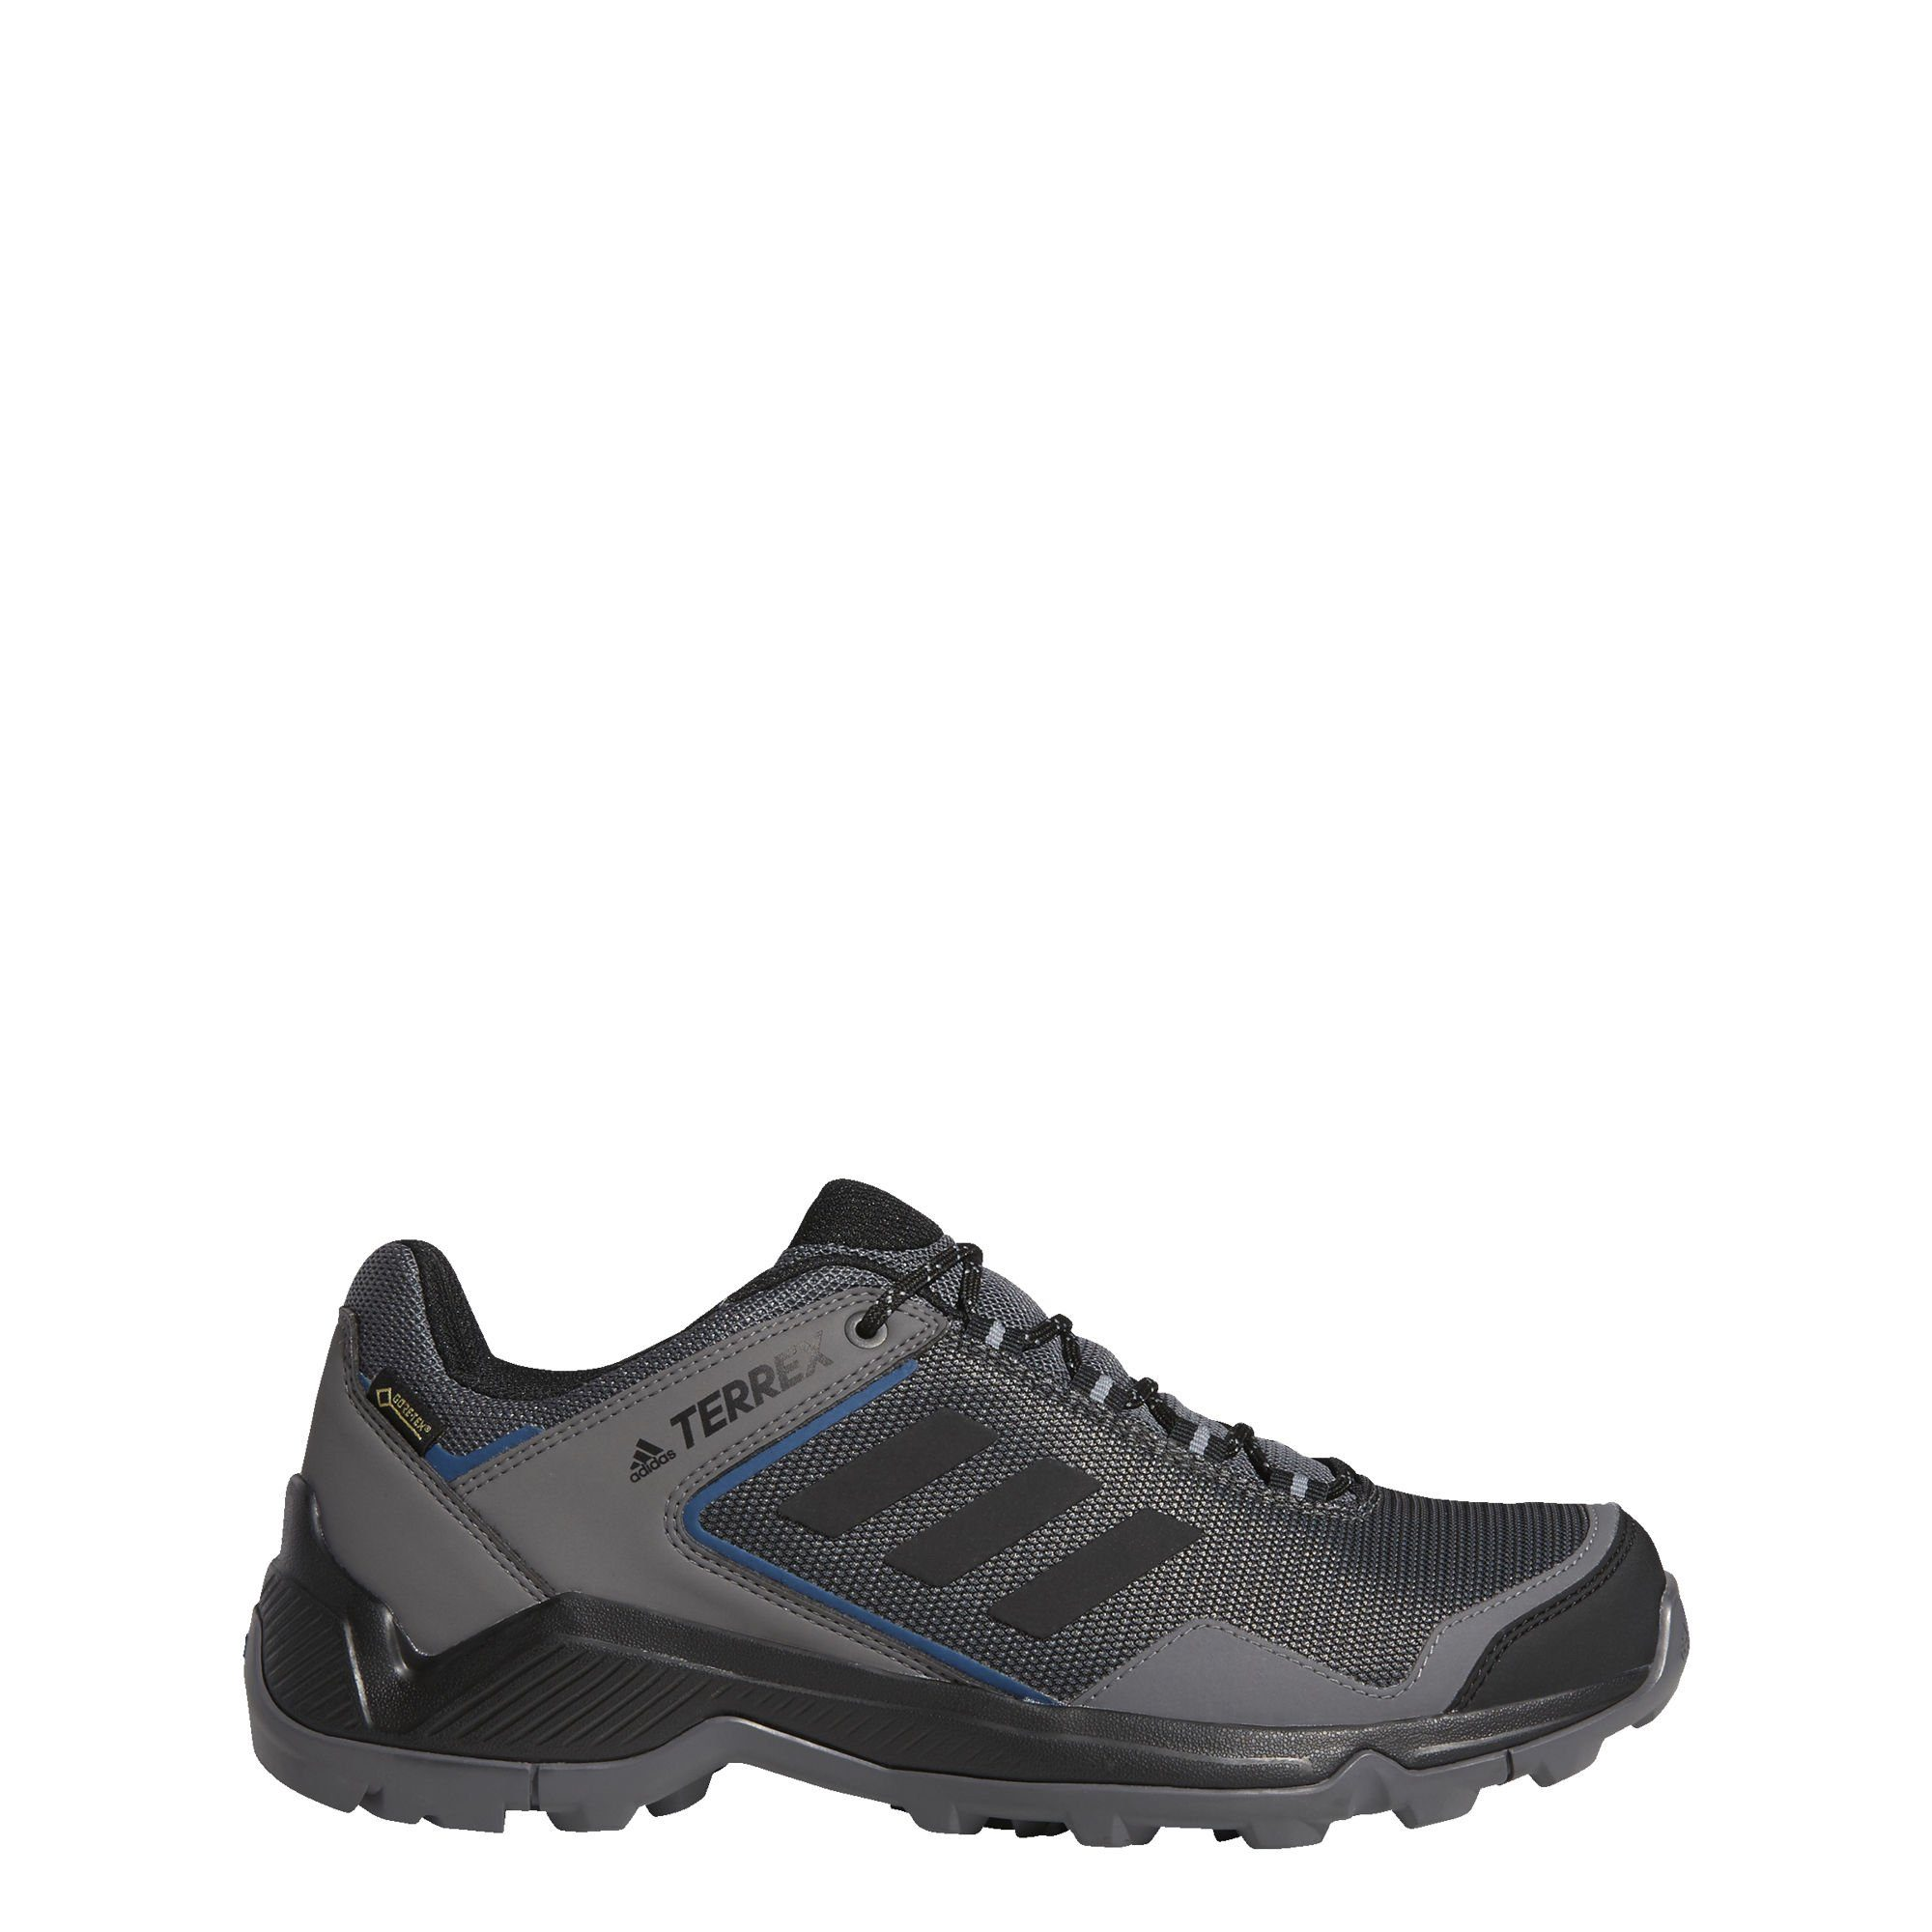 adidas Performance »TERREX Eastrail GTX Schuh« Outdoorschuh Outdoorschuh online kaufen | OTTO